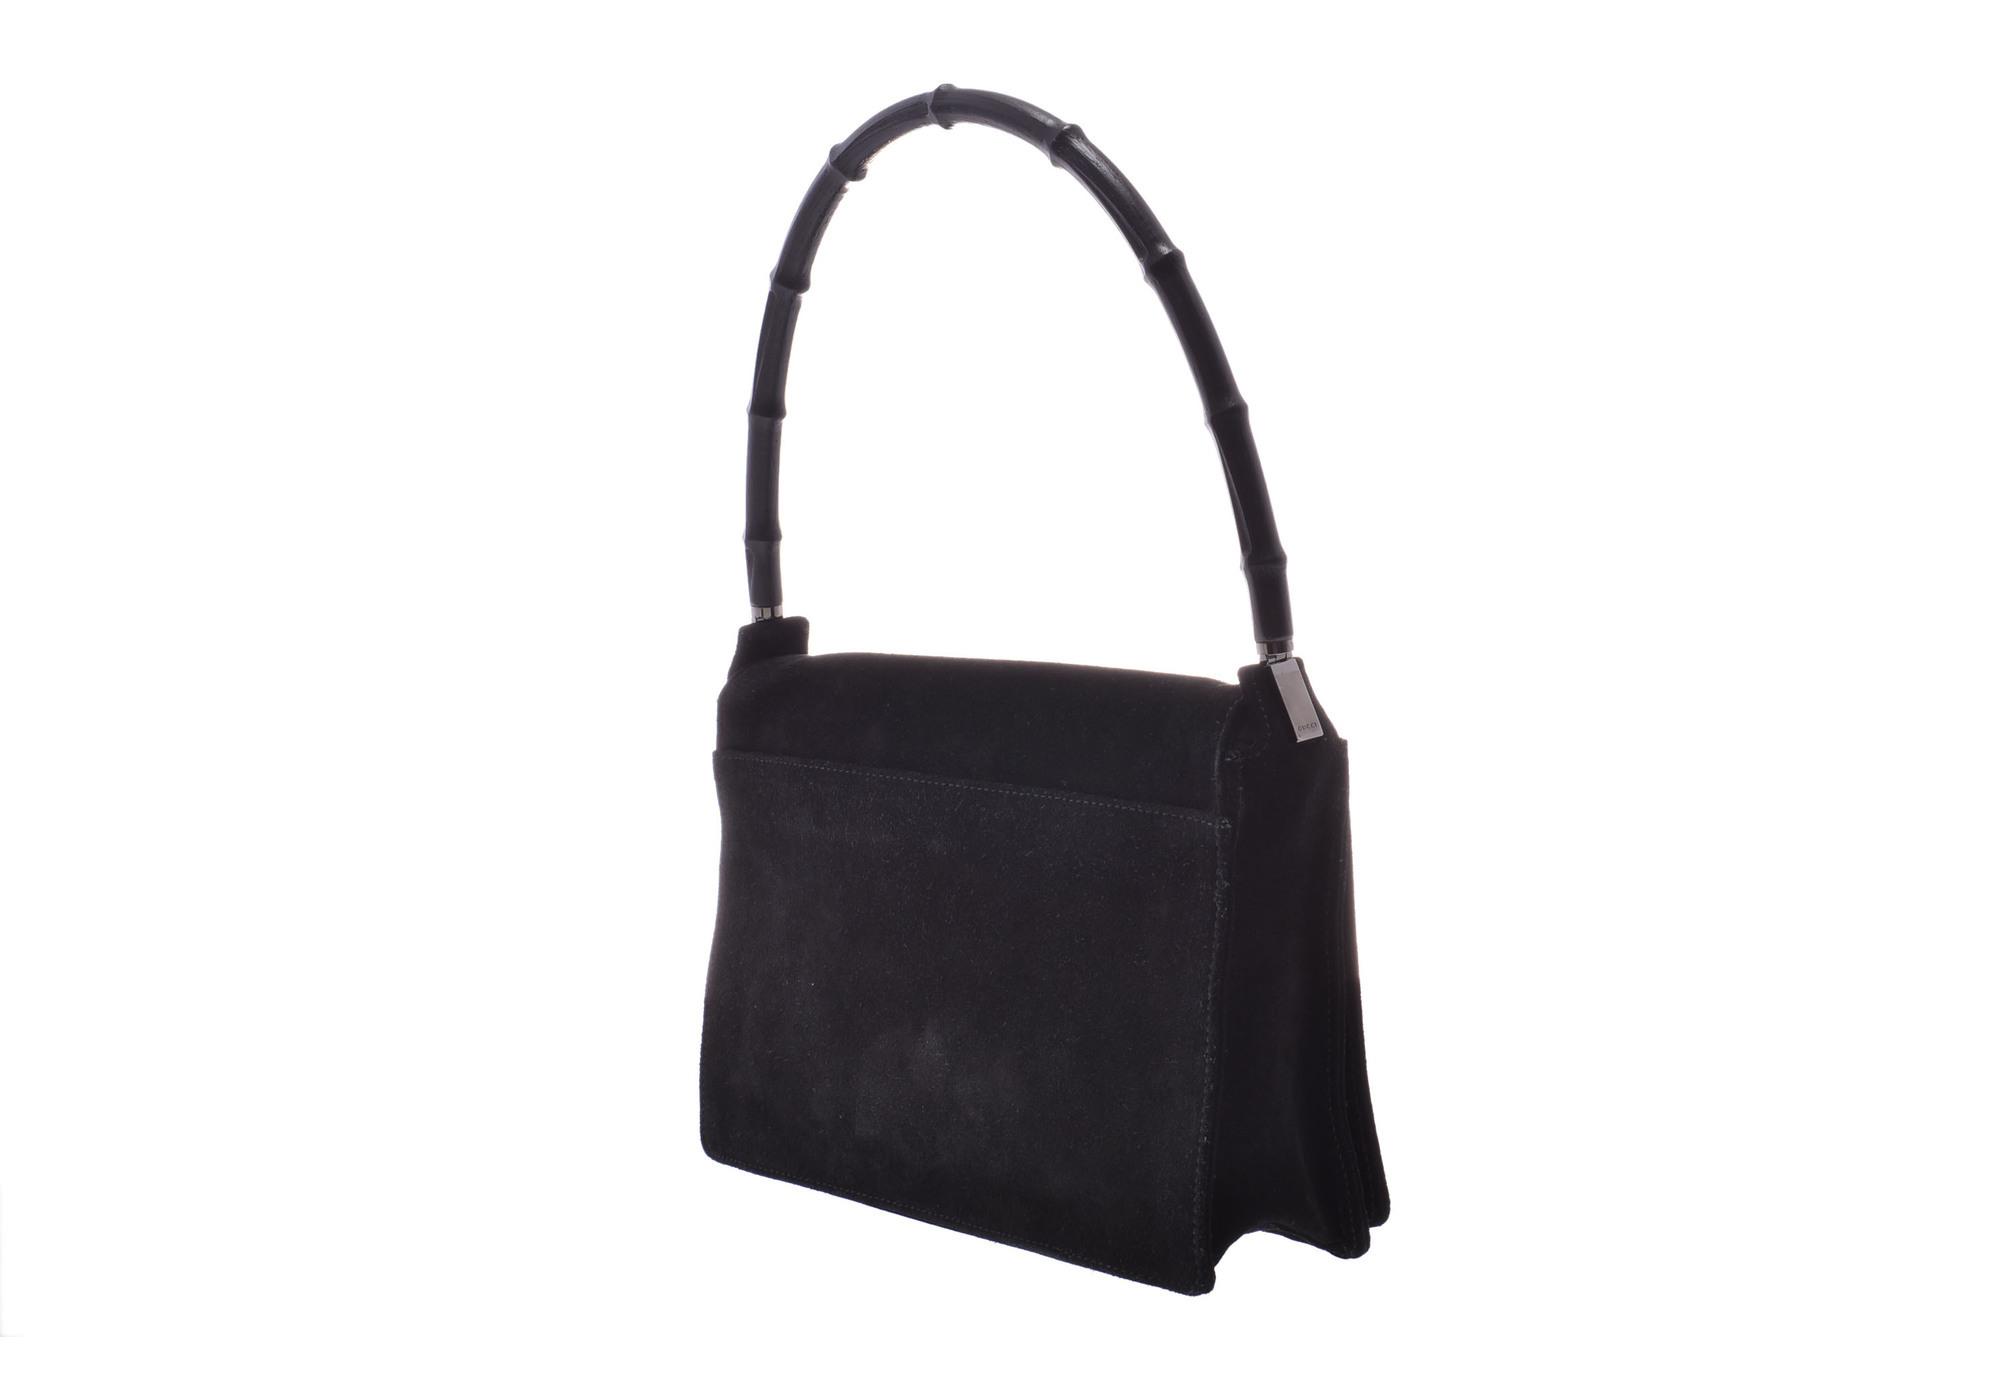 6019aec6b Authentic Gucci Bamboo Semi Shoulder Bag Suede Bag Black ...